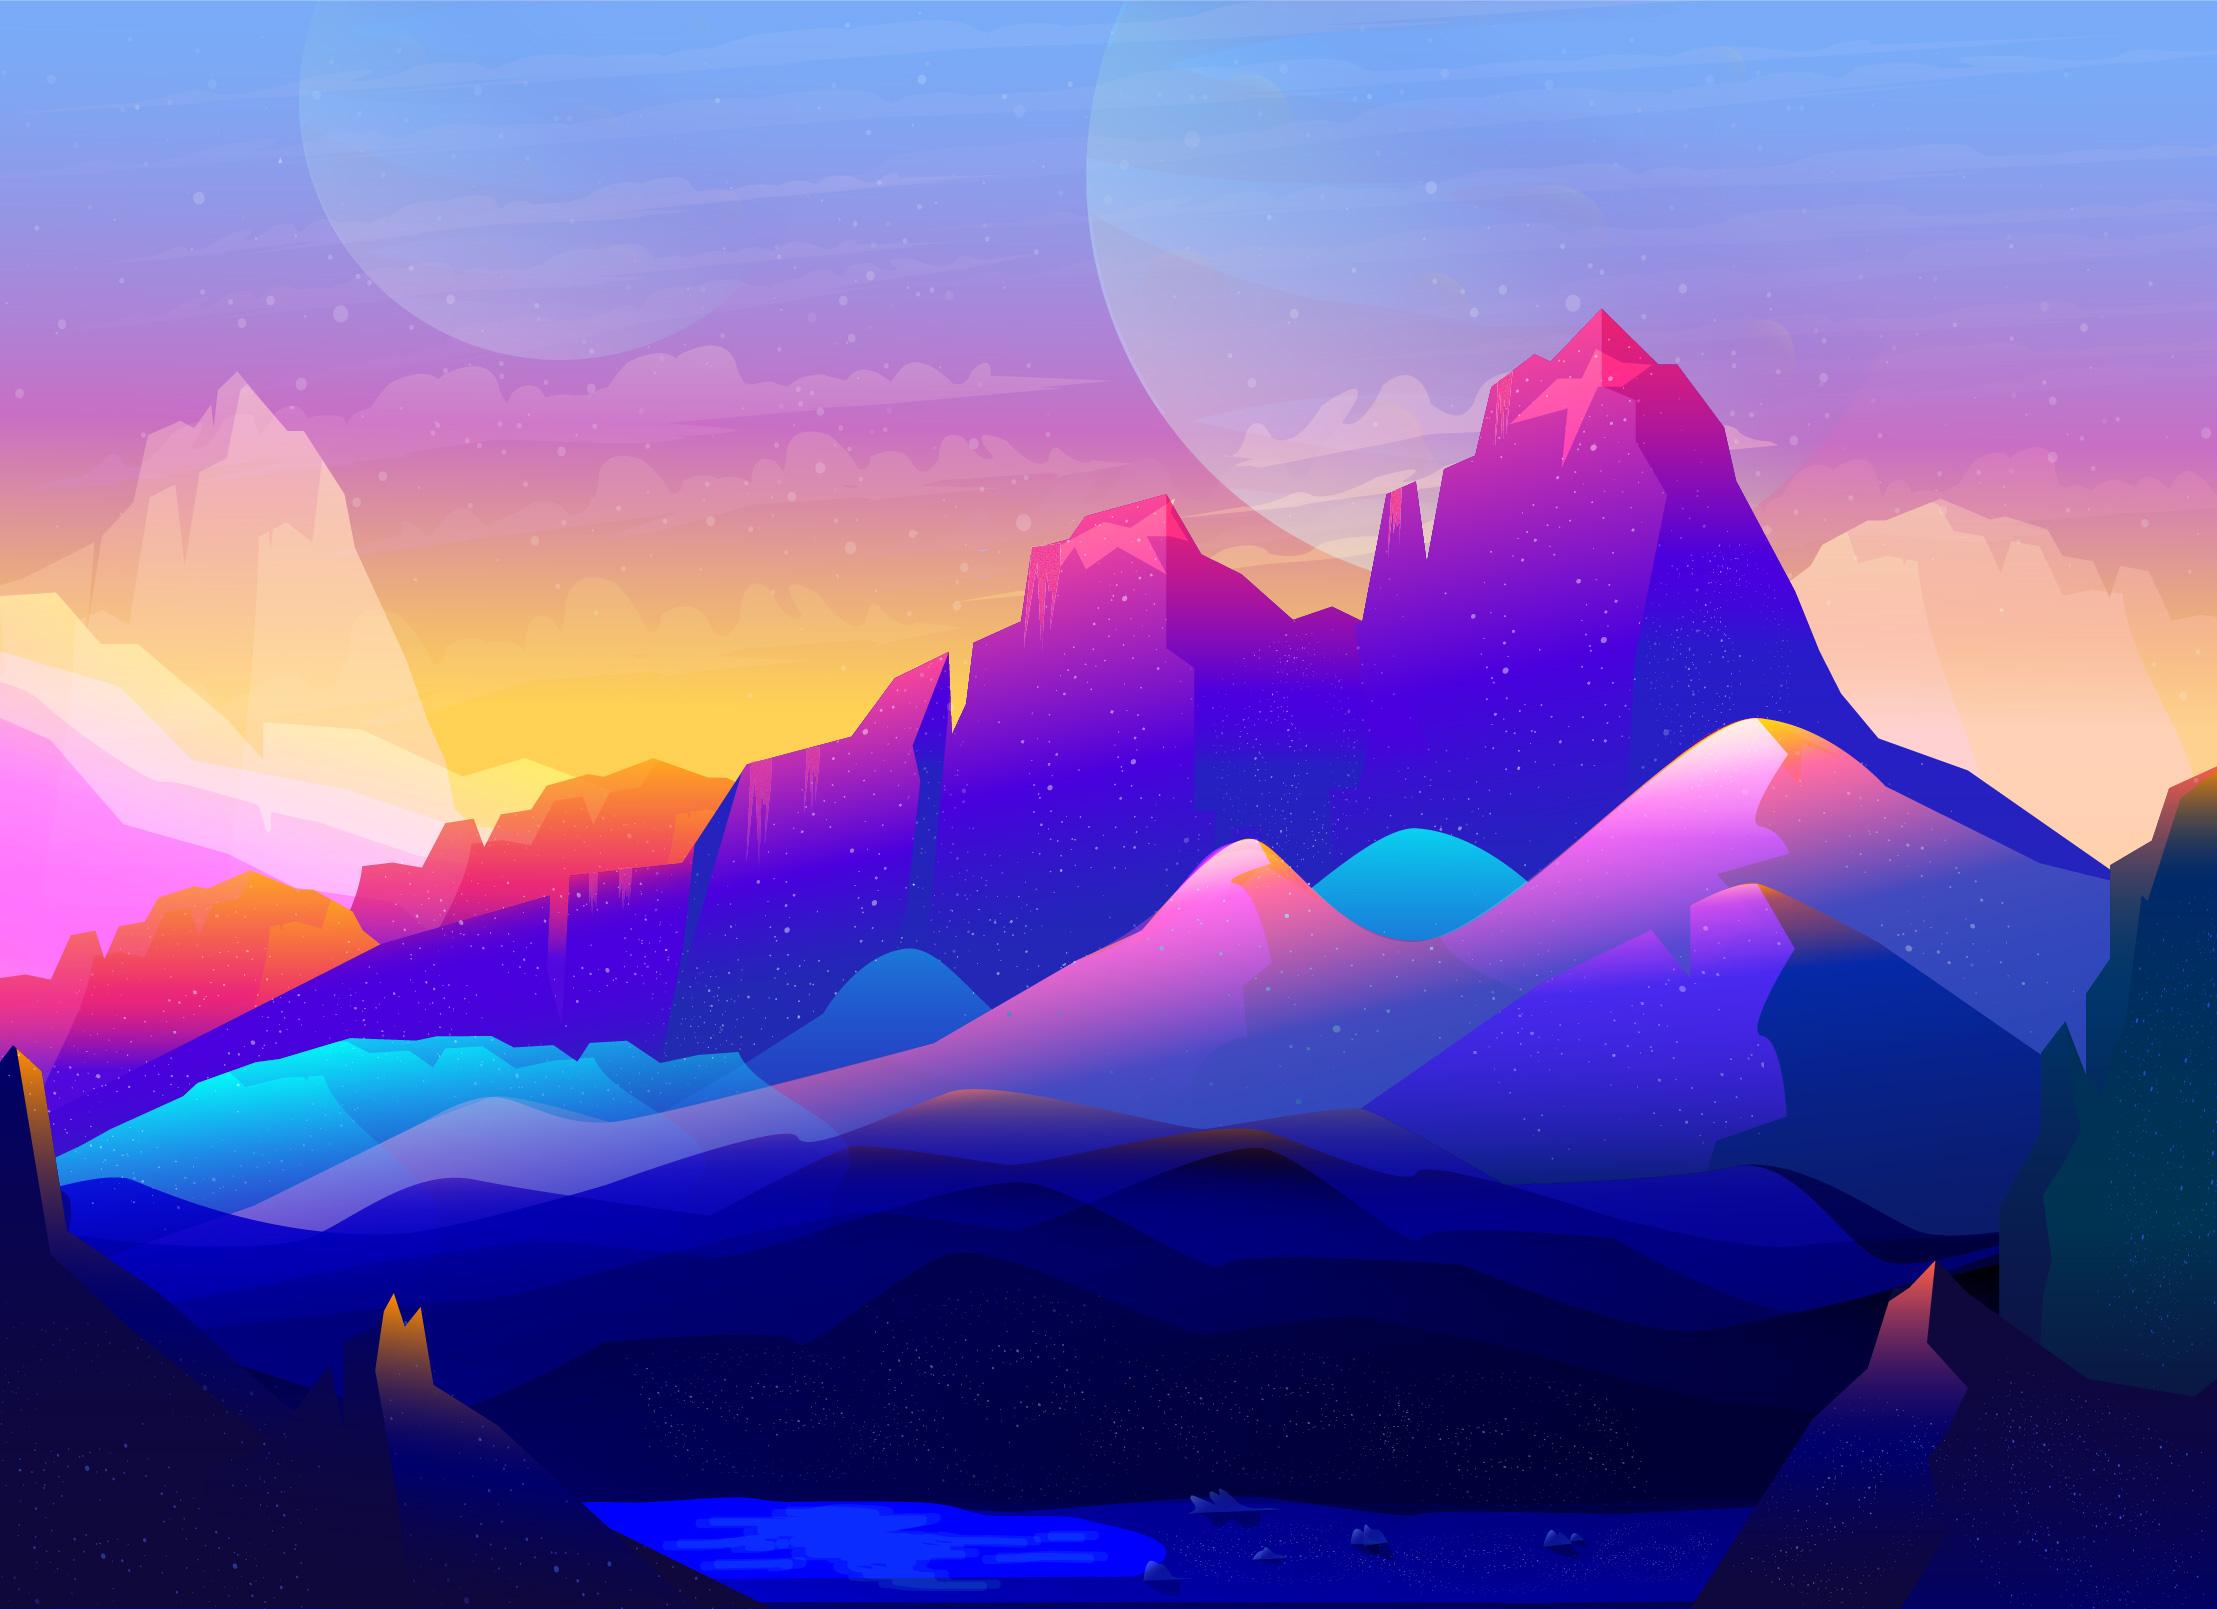 Minimalism Mountain Peak Full Hd Wallpaper: Rock Mountains Landscape Colorful Illustration Minimalist